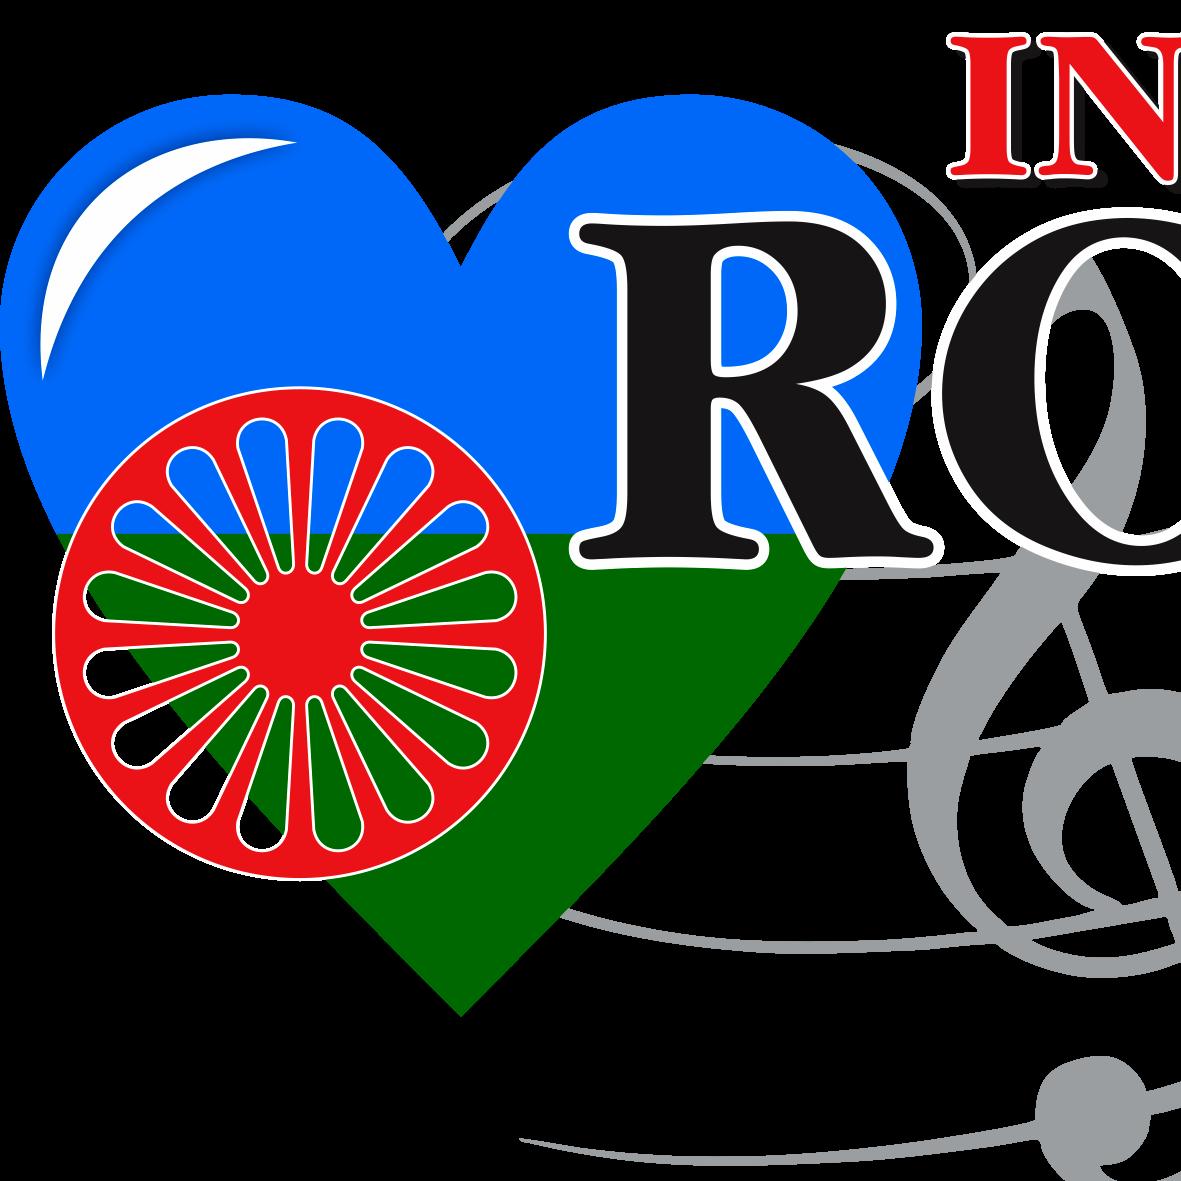 Internet Radfio Romsko Srce